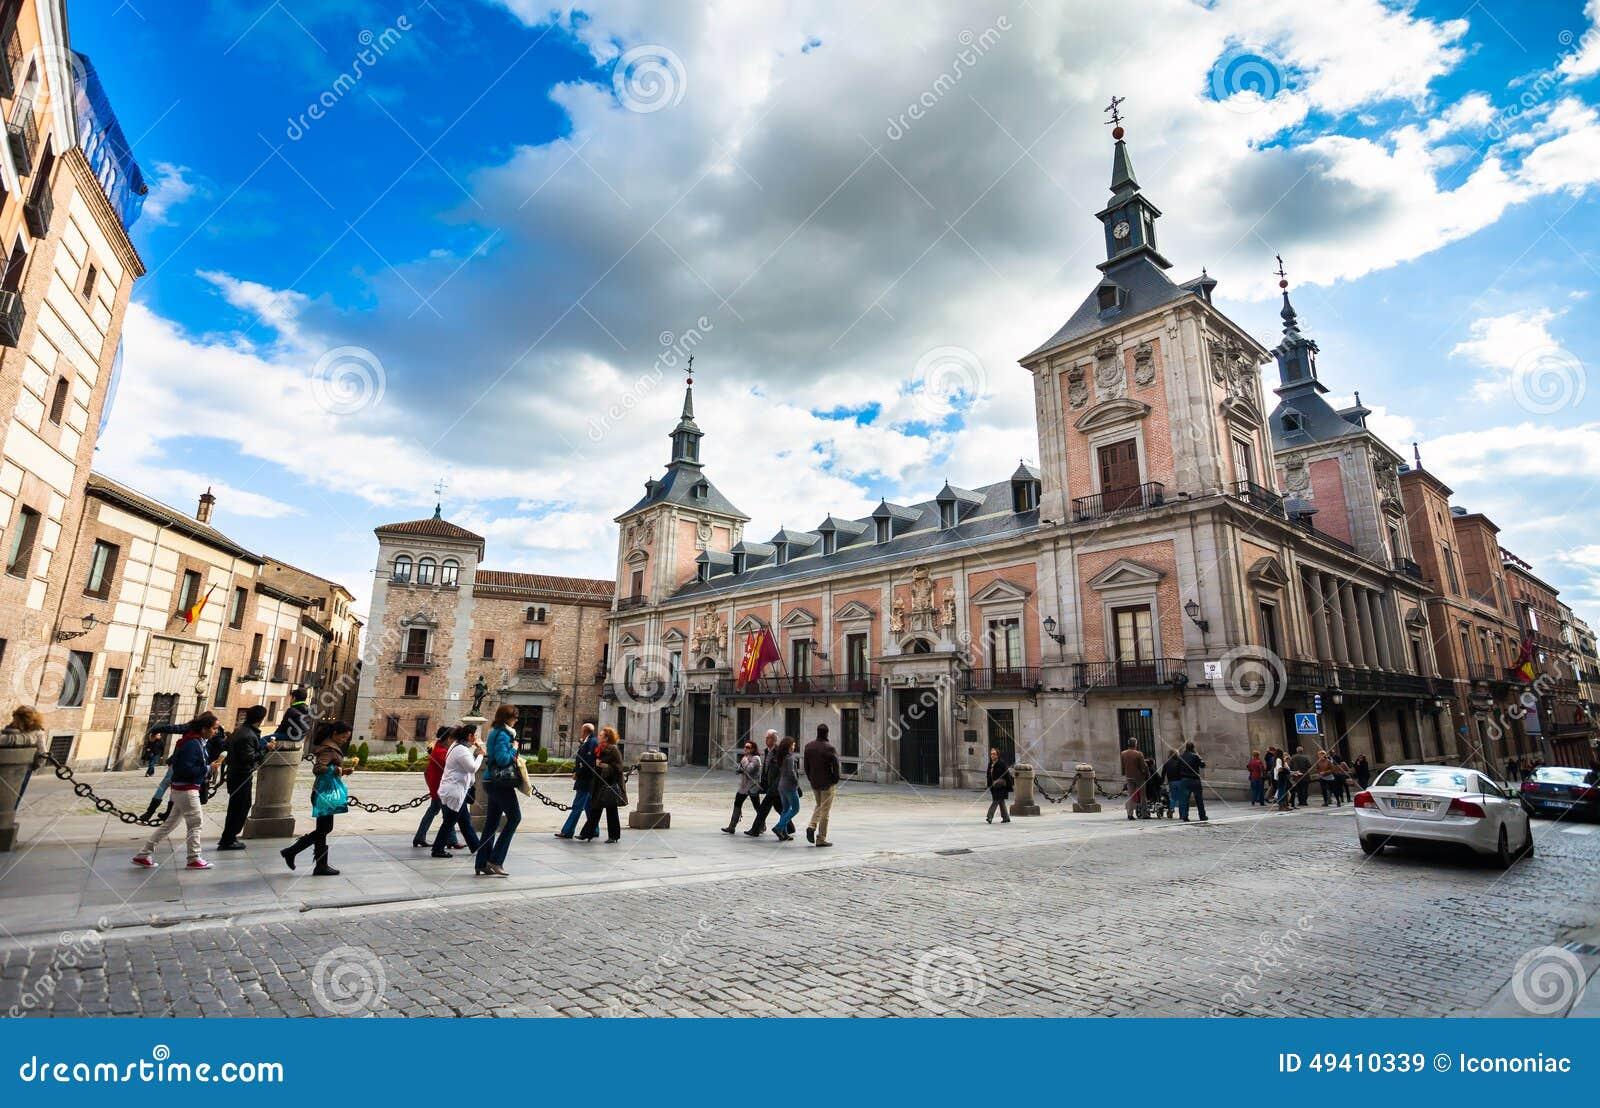 Download Casa De La Villa Im Landhaus-Quadrat (Plaza De La Villa) Die Stadt Ha Redaktionelles Stockbild - Bild von madrid, outdoor: 49410339